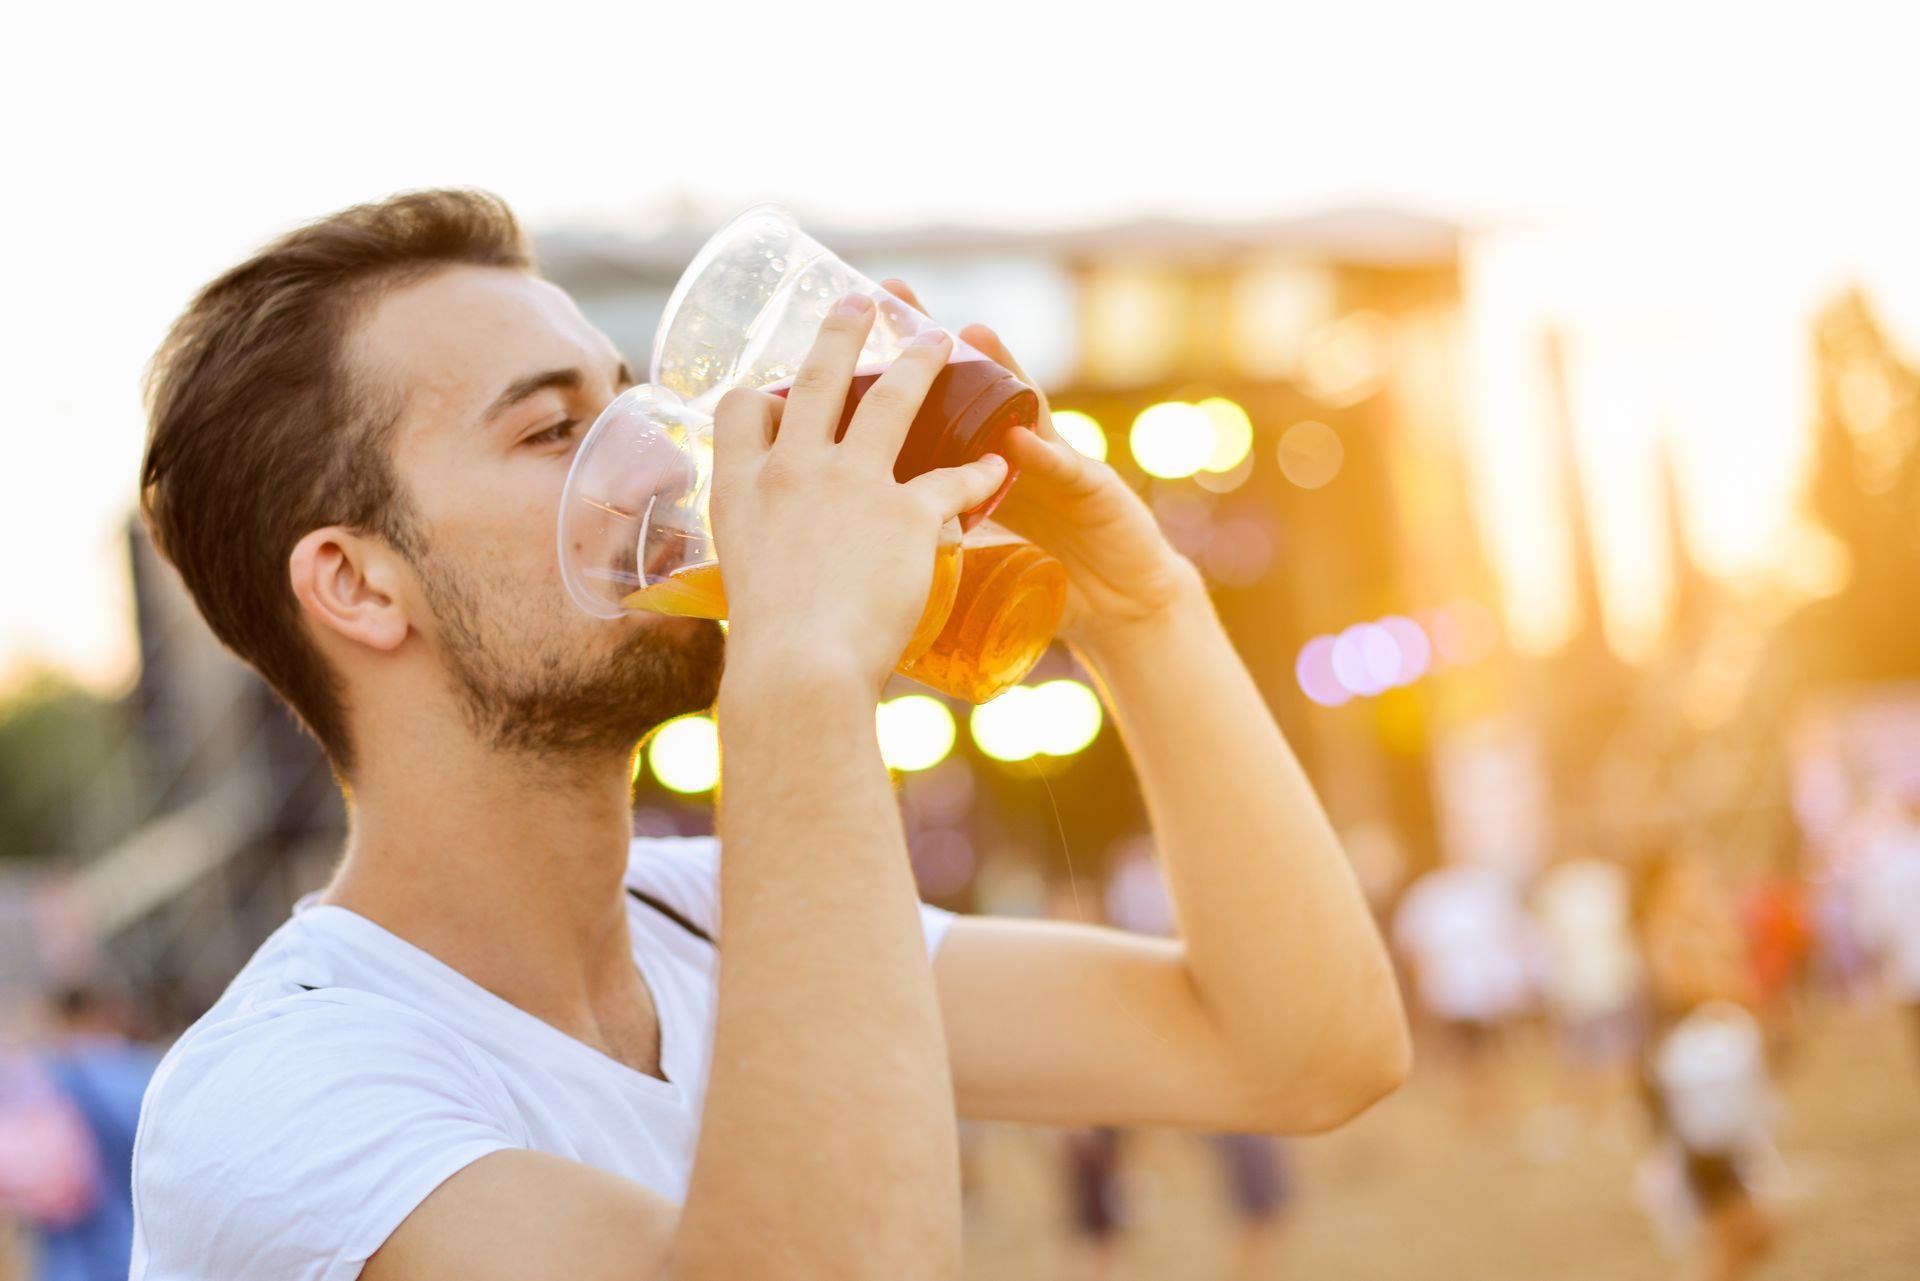 What is Binge Drinking? Top 7 Associated Dangers